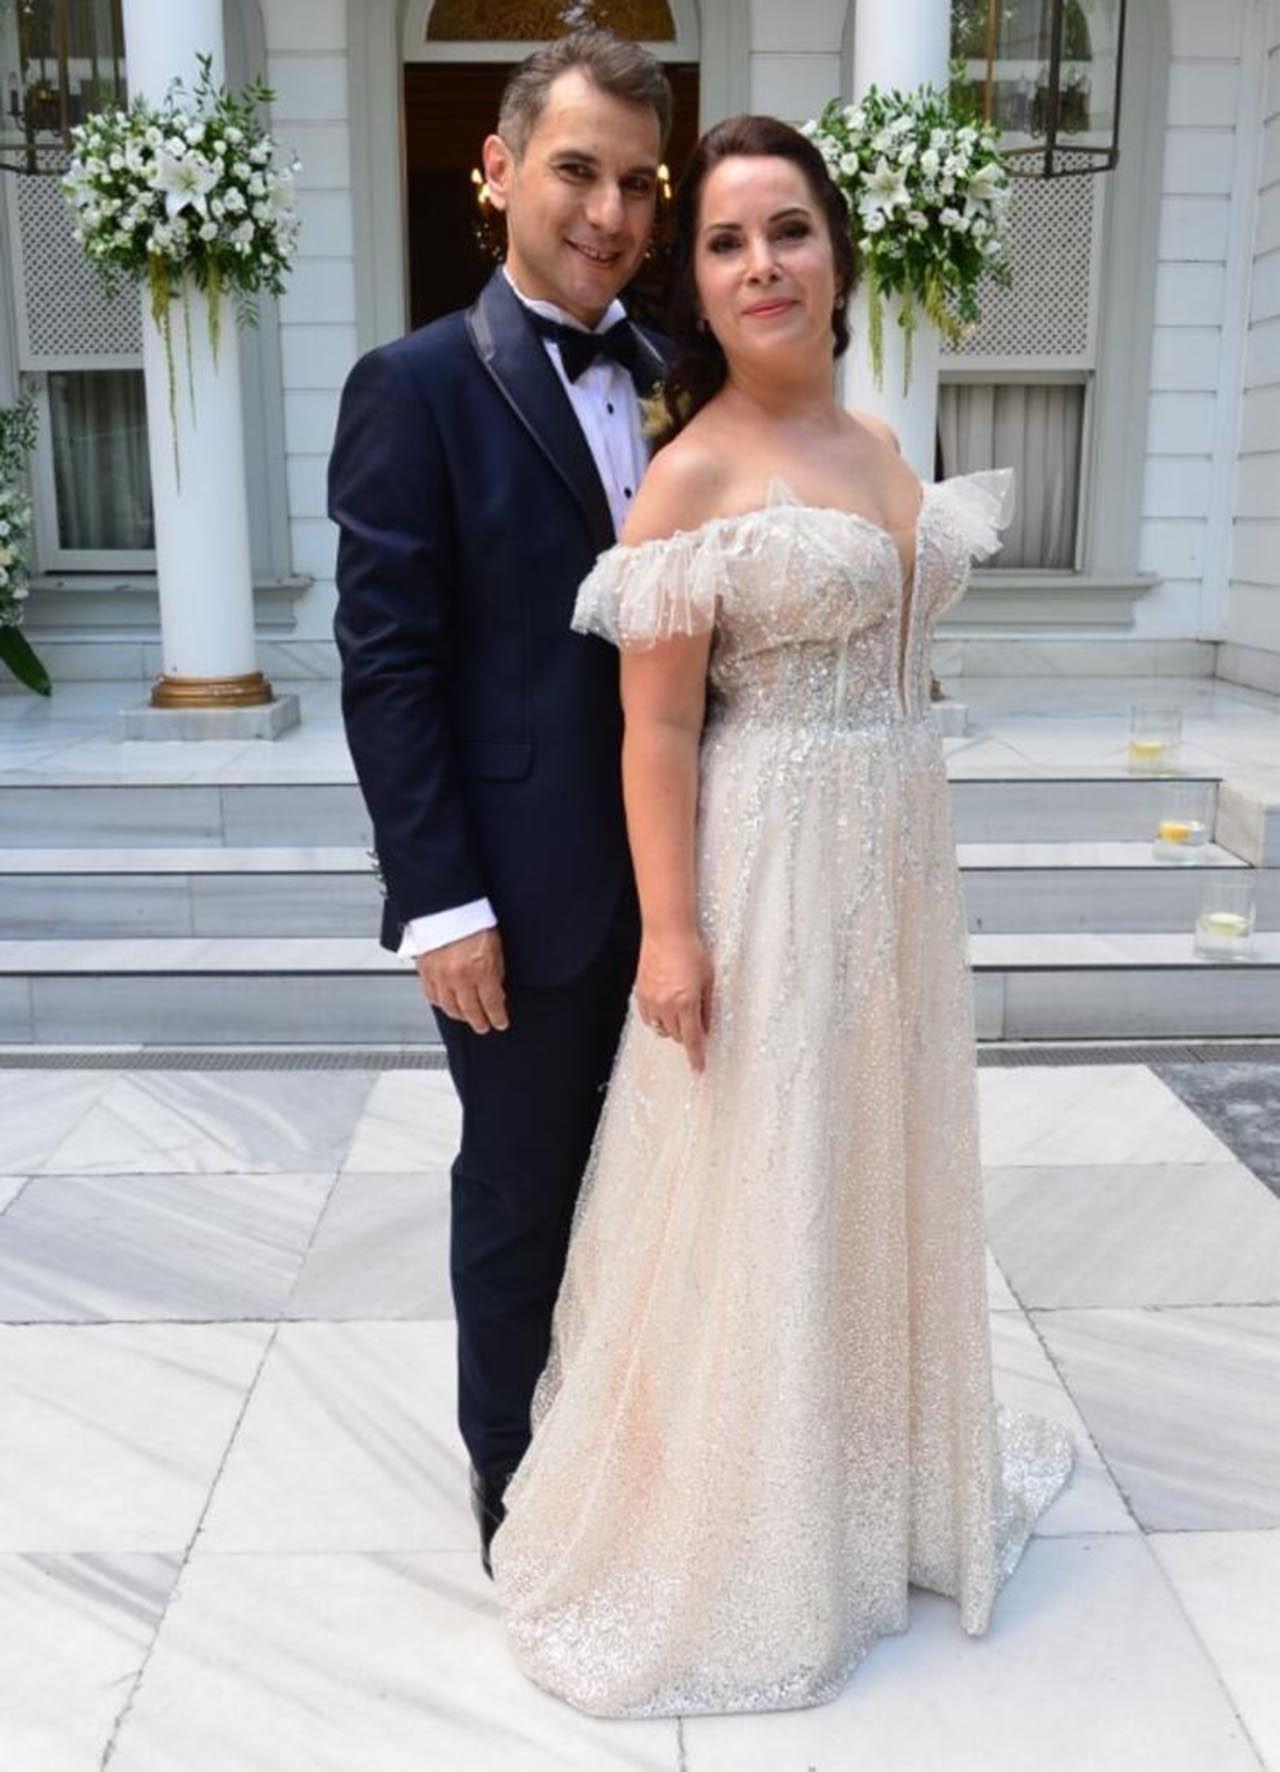 Oyuncu Sevinç Erbulak ve Volkan Cengen evlendi - Resim: 2